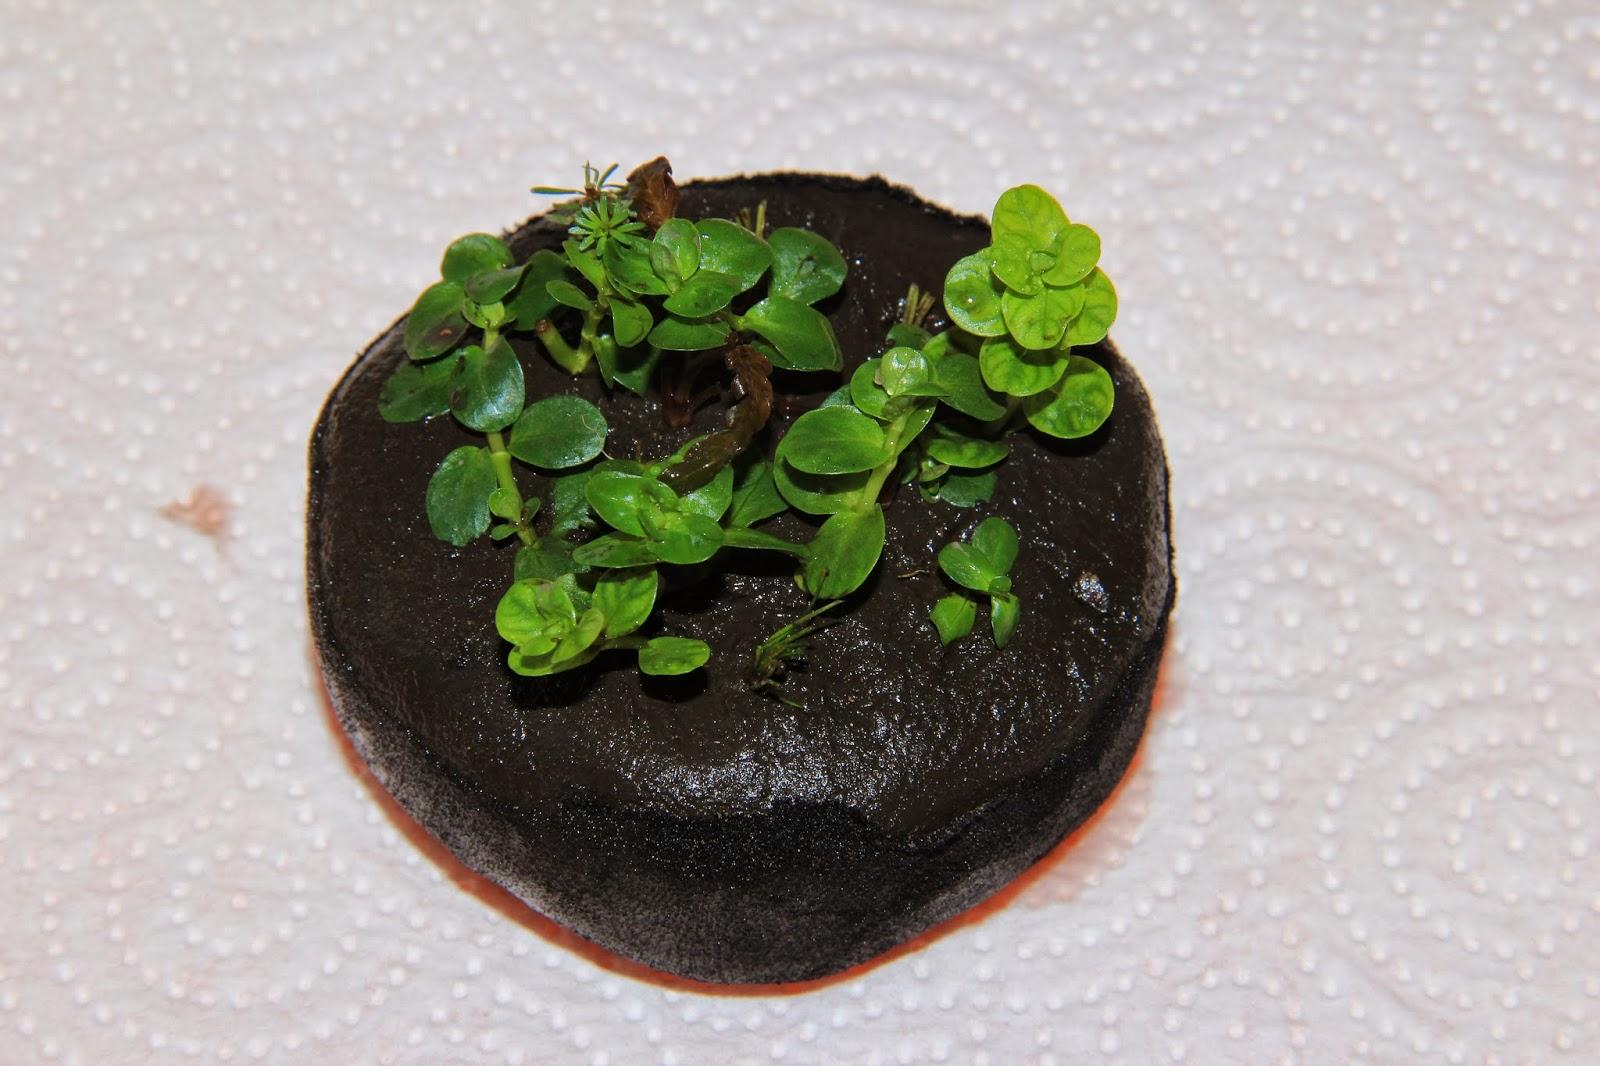 Rotala sp green Wabikusa